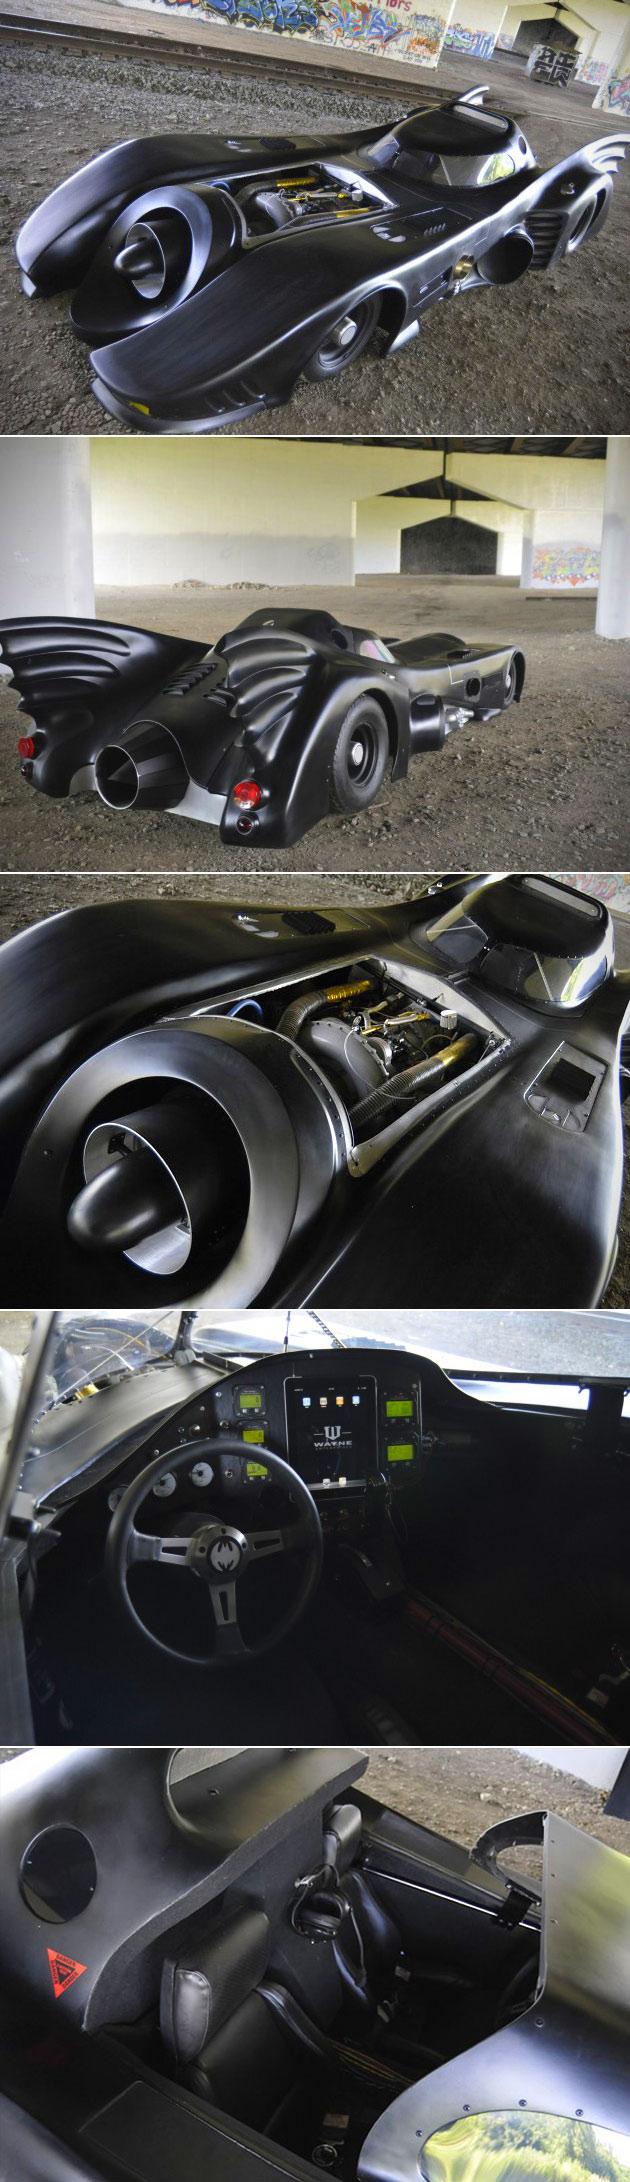 Jet Powered Batmobile